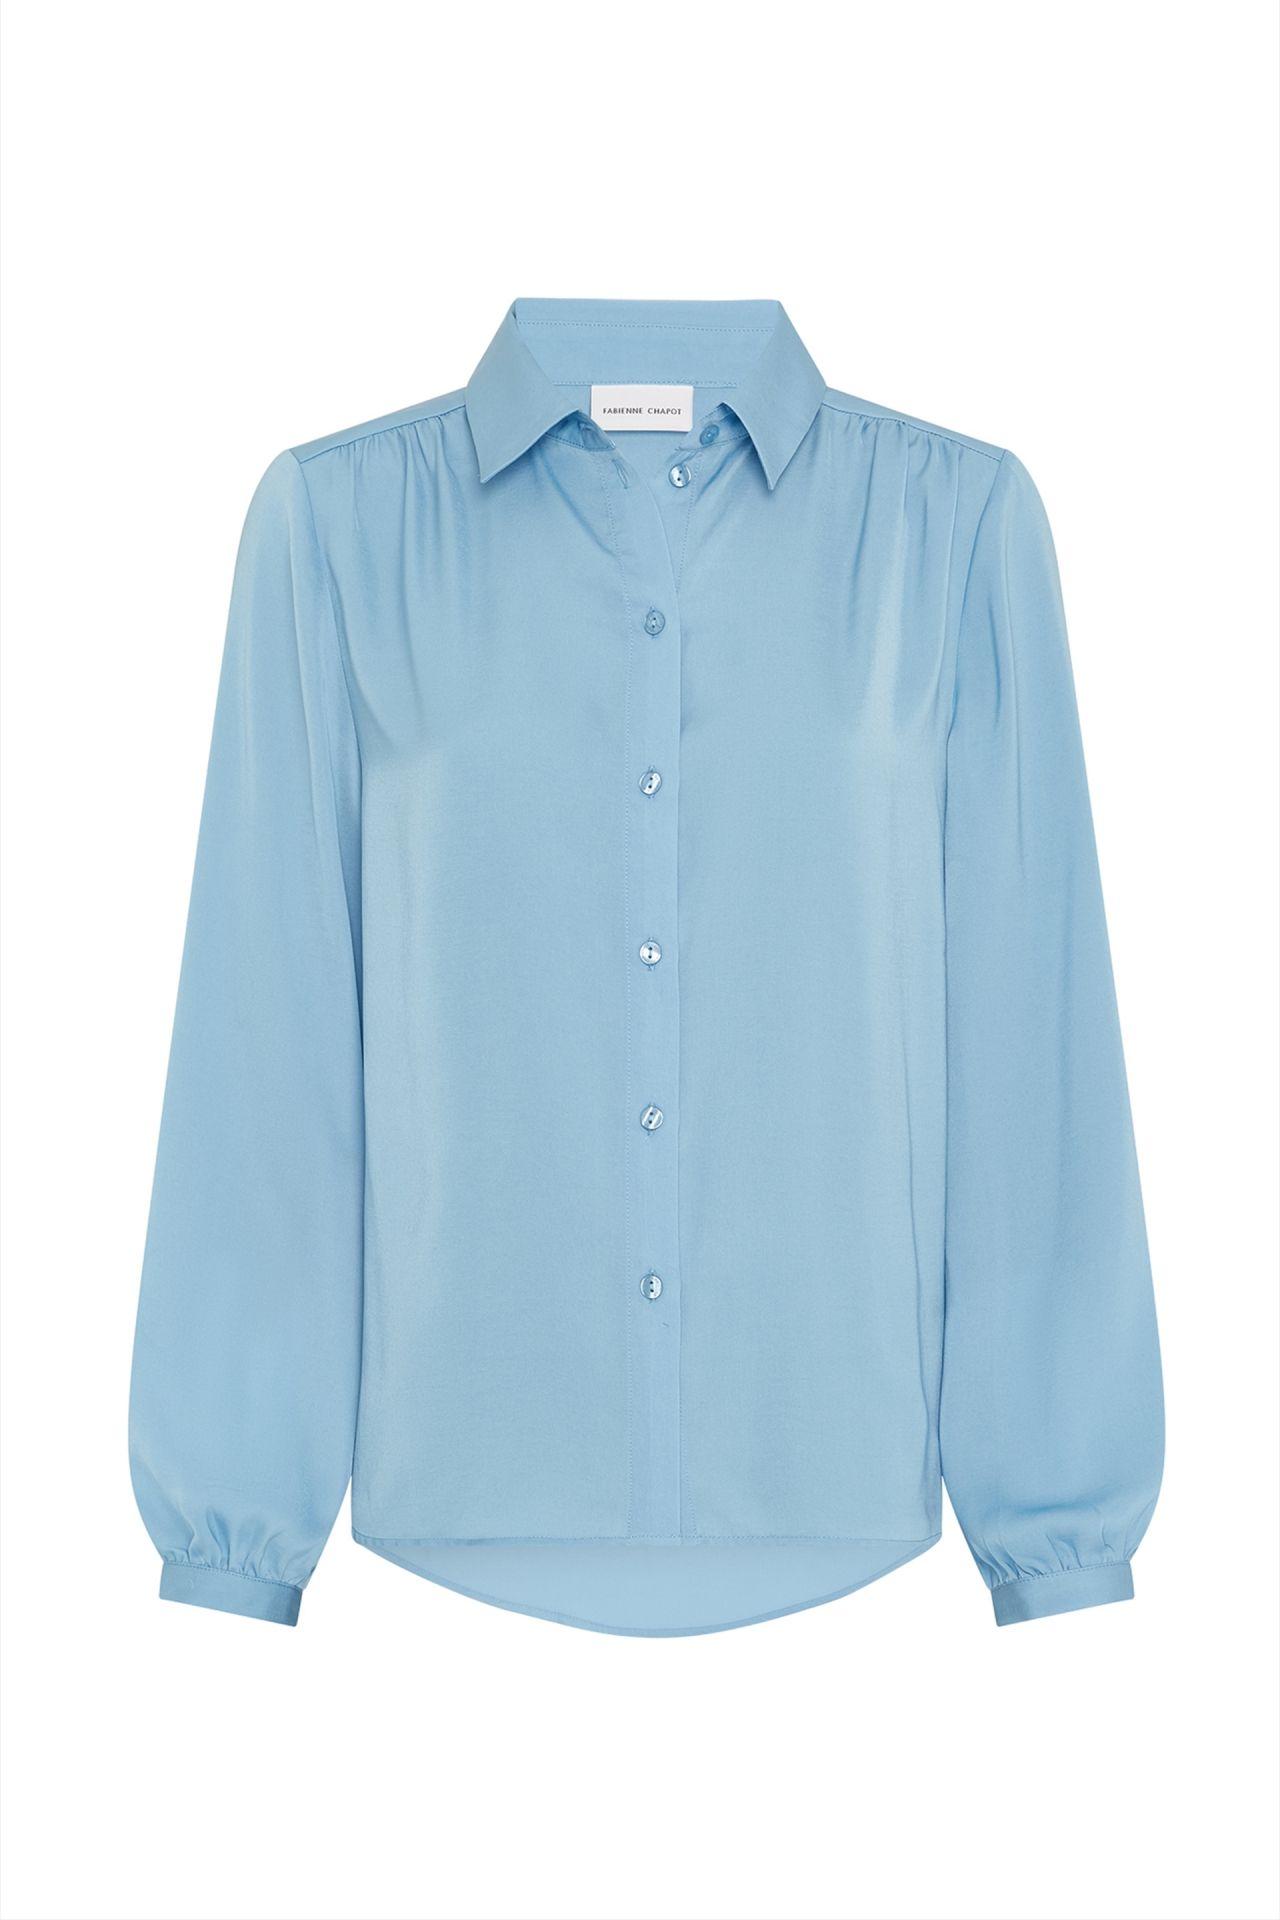 Blauwe dames blouse - Fabienne Chapot - Mira solid blouse - ice blue